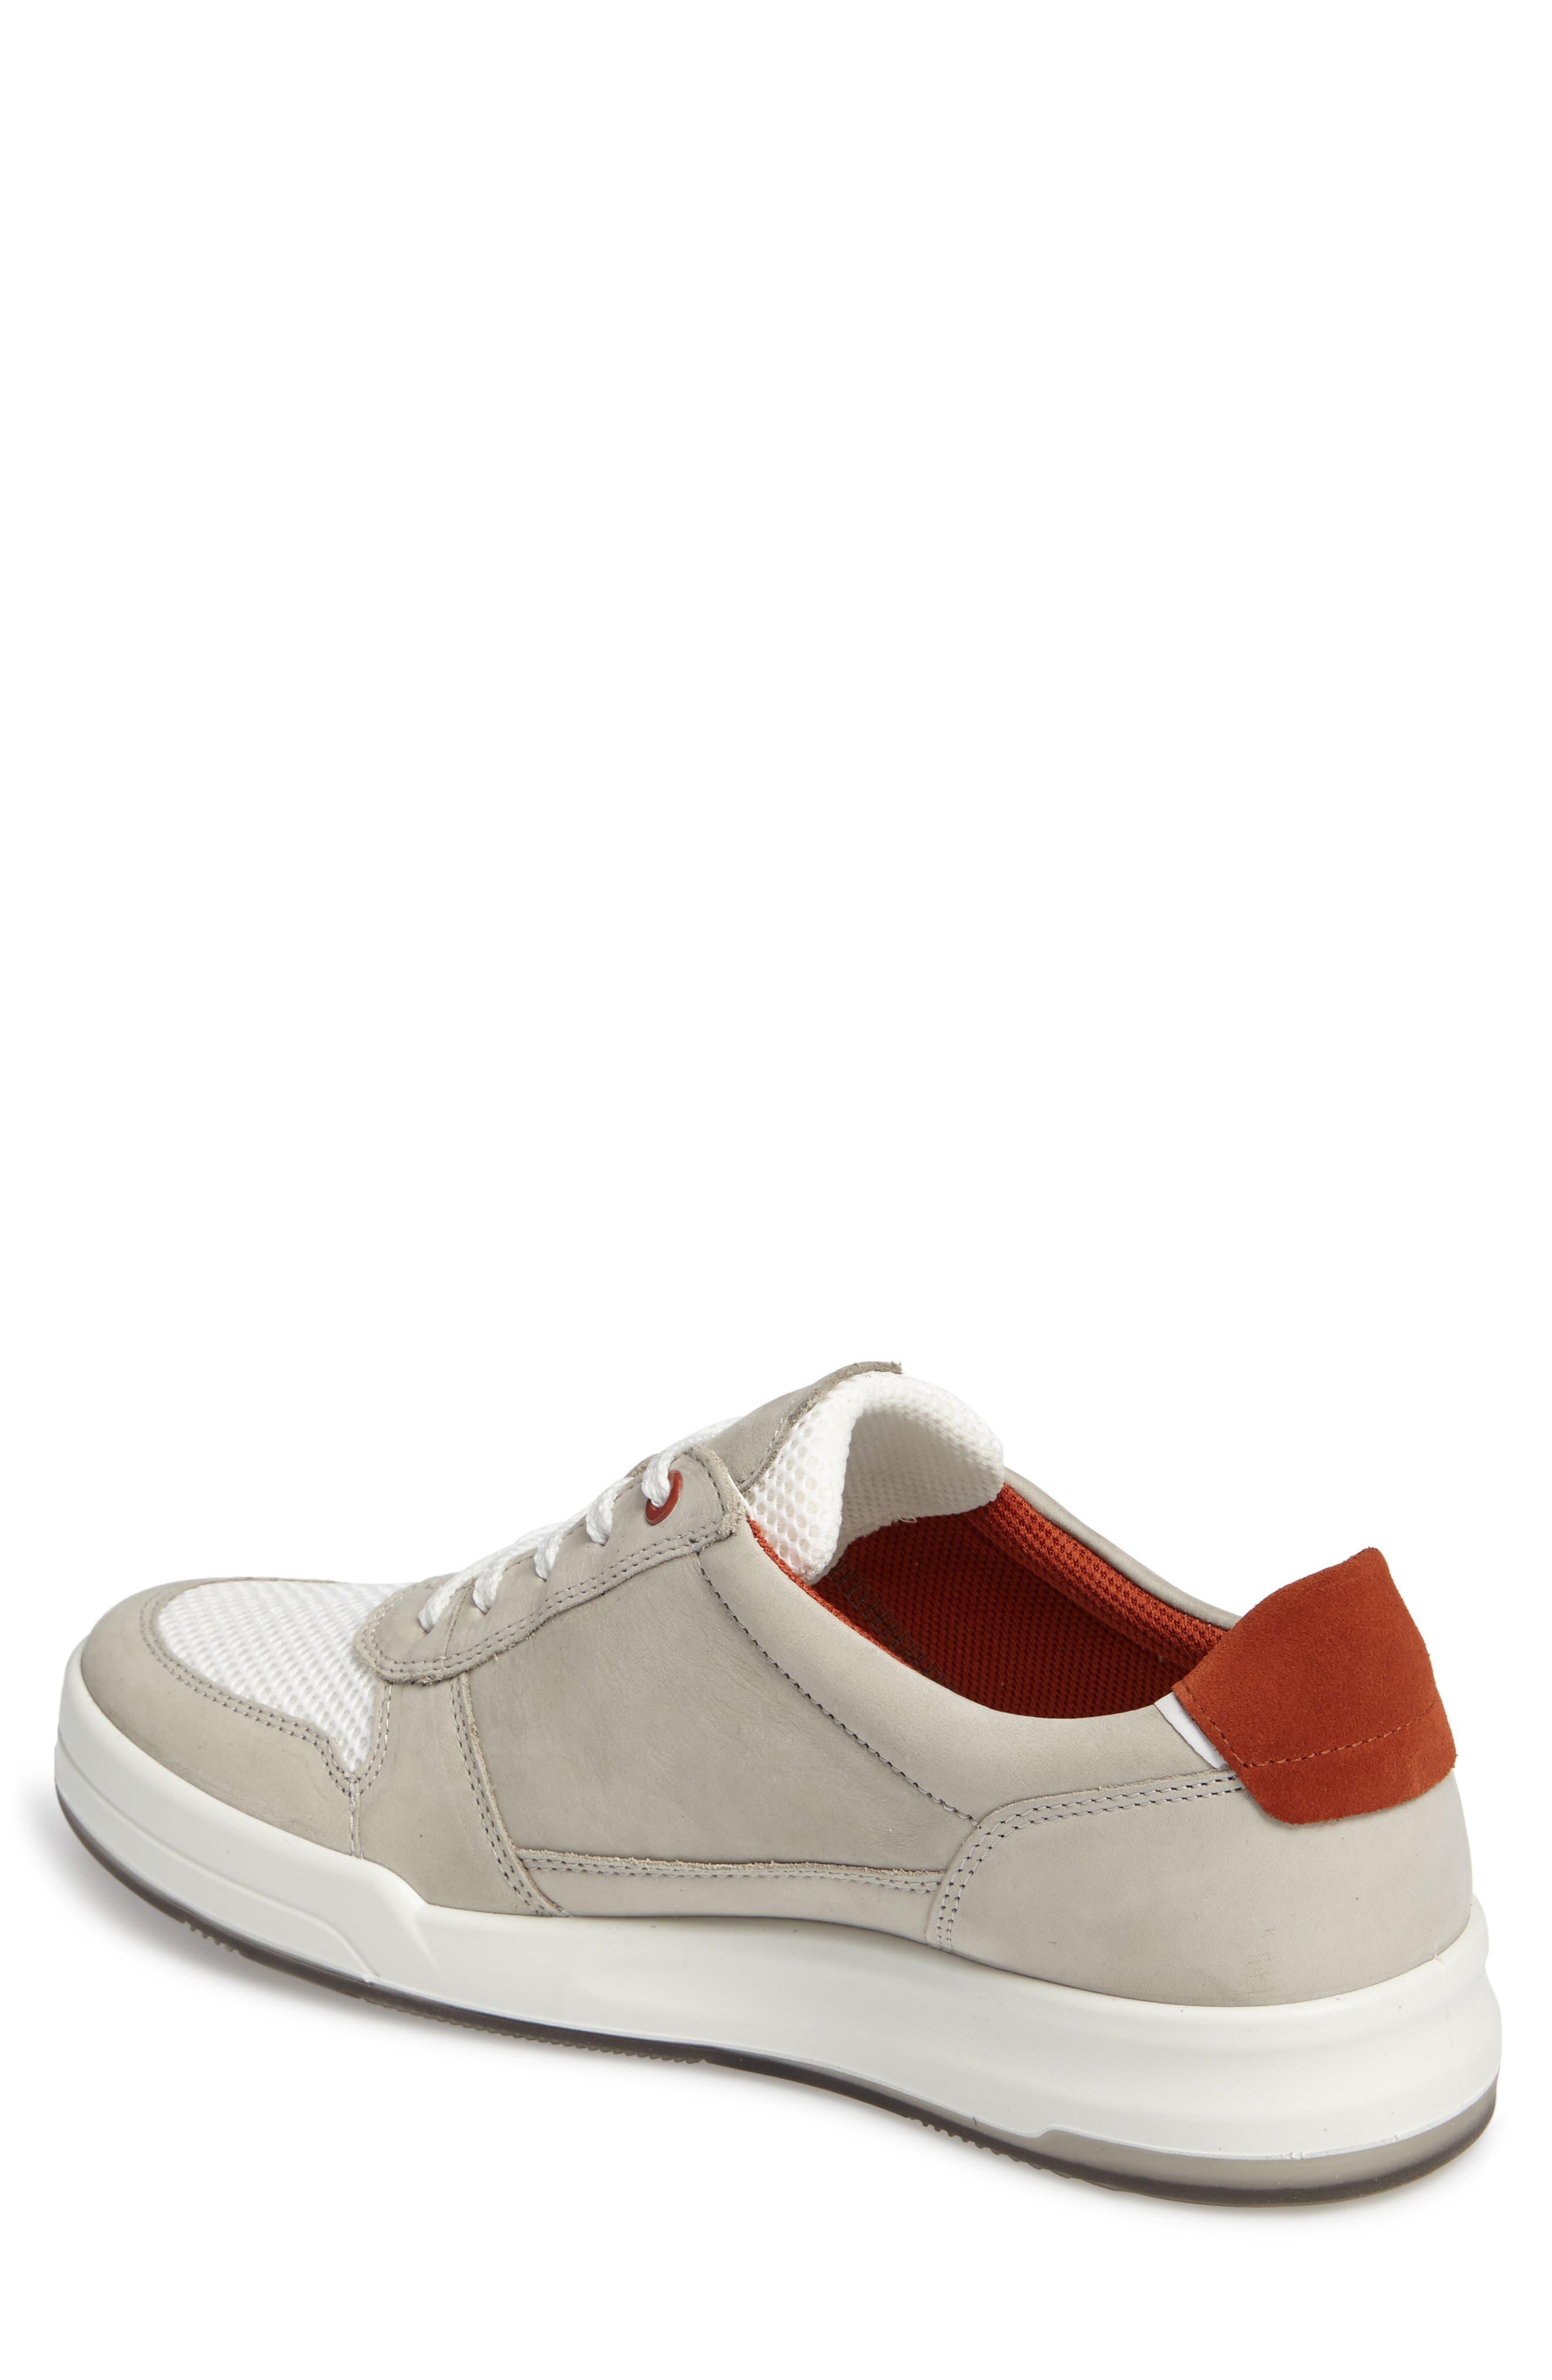 Jack Sneaker,                             Alternate thumbnail 2, color,                             053